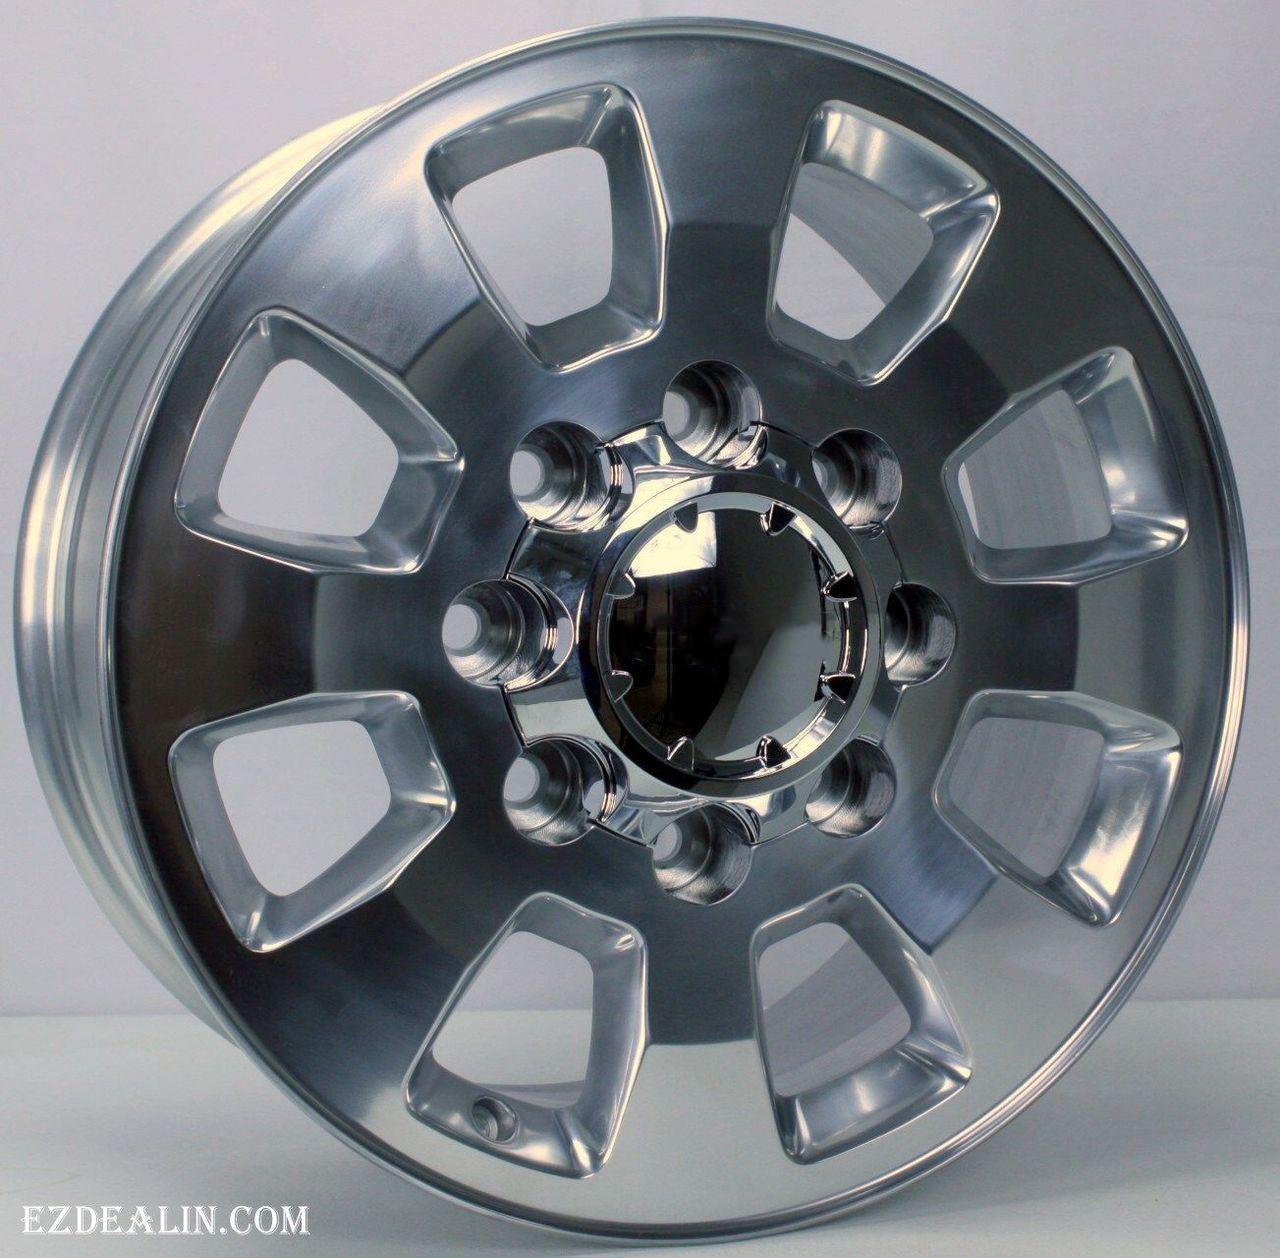 2011 2018 Gmc Sierra 2500 Polished Aluminum 18 8 Lug Wheels Rims 8 180